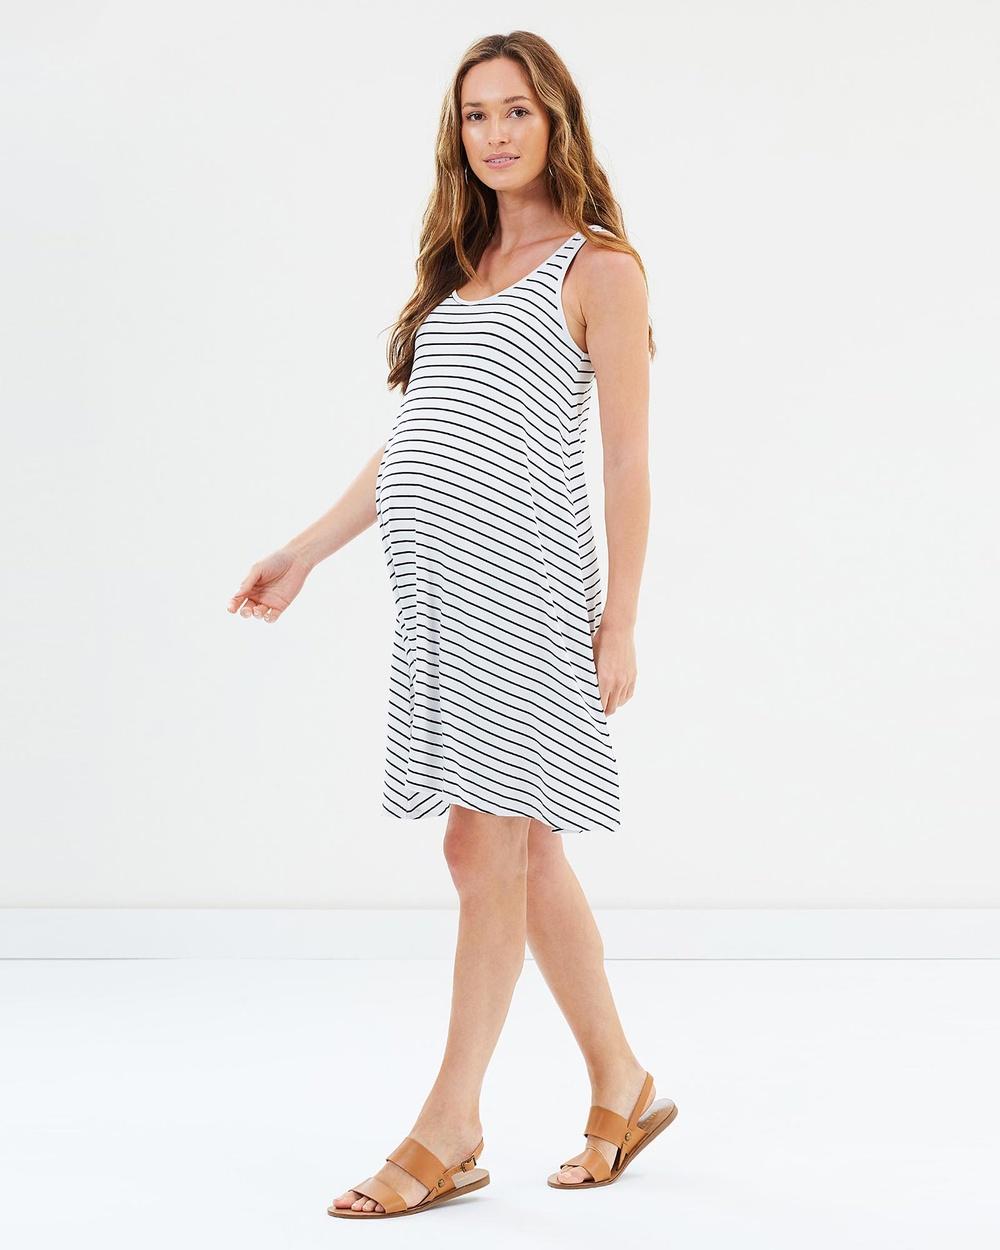 Bamboo Body Swing Dress Dresses White & Black Stripe Swing Dress